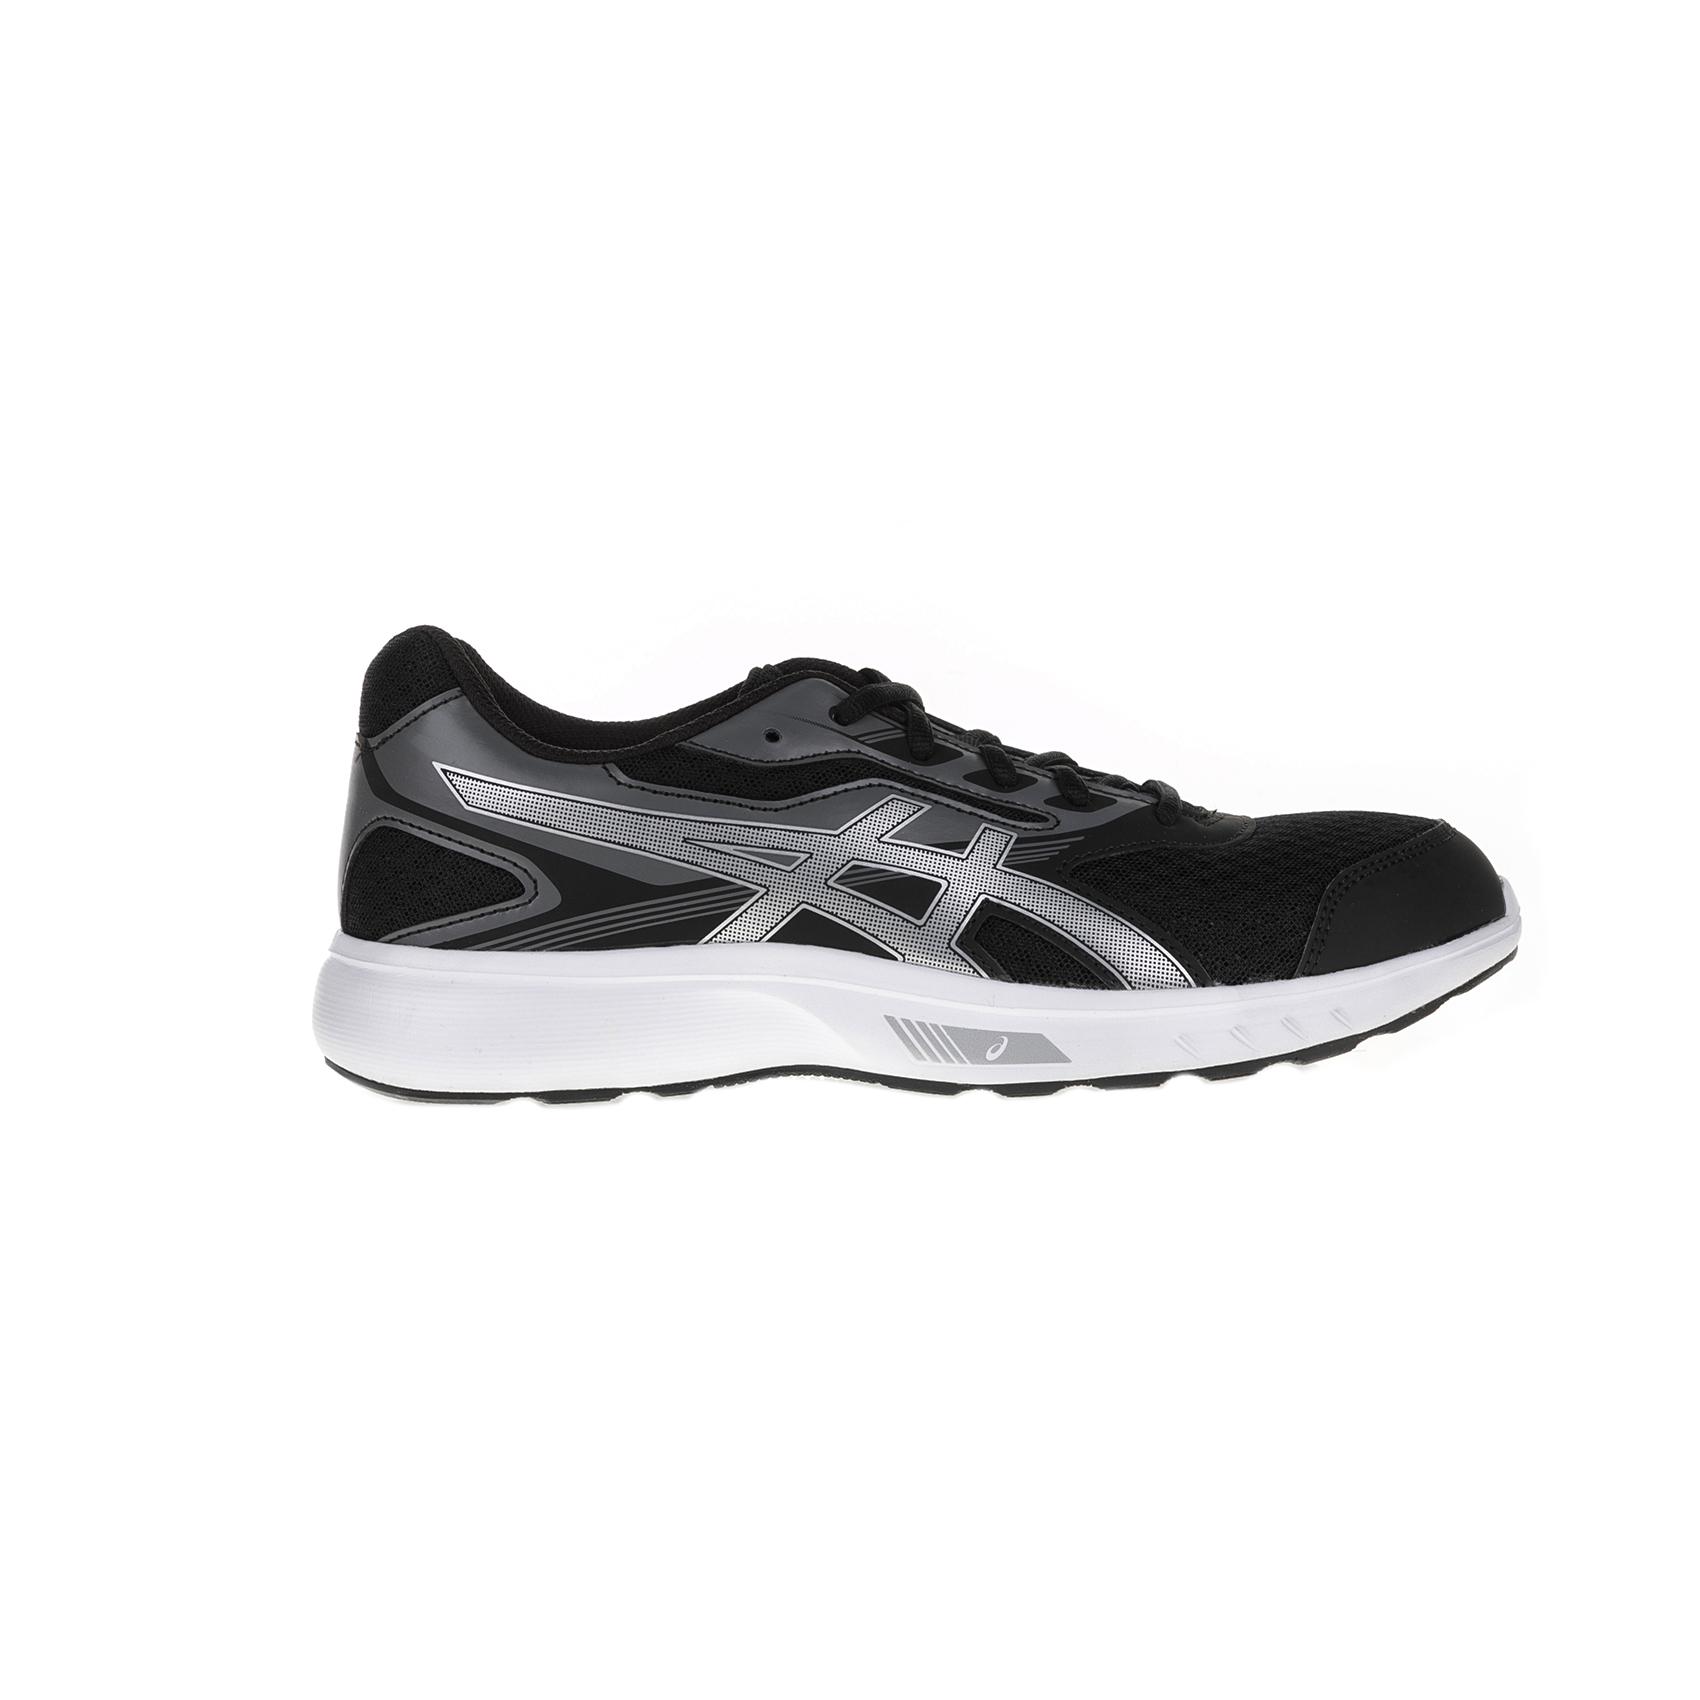 ASICS – Ανδρικά παπούτσια ASICS STORMER μαύρα